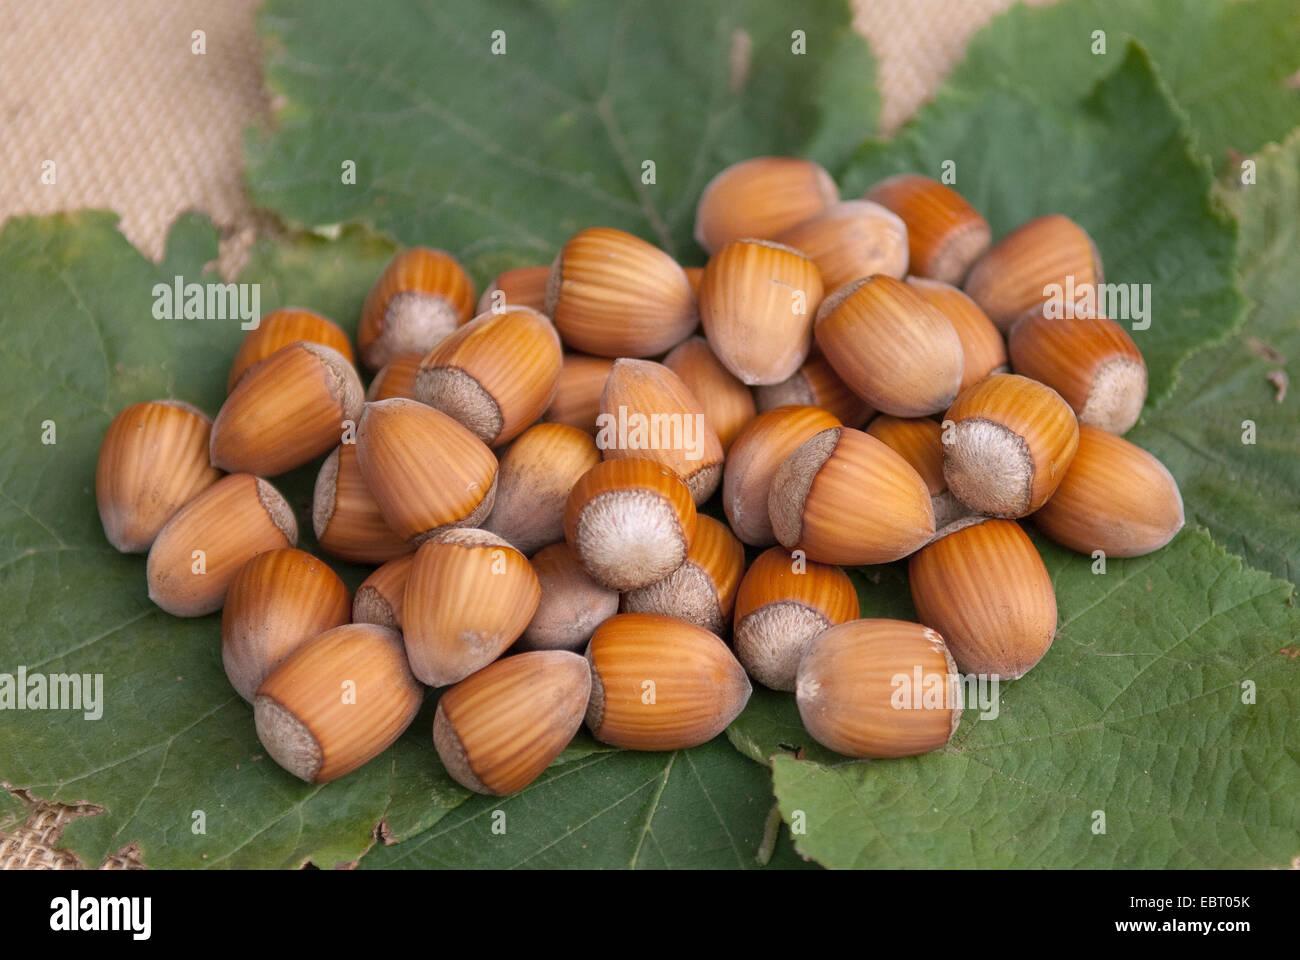 Common hazel (Corylus avellana 'Englische Riesen', Corylus avellana Englische Riesen), hazelnuts of cultivar - Stock Image